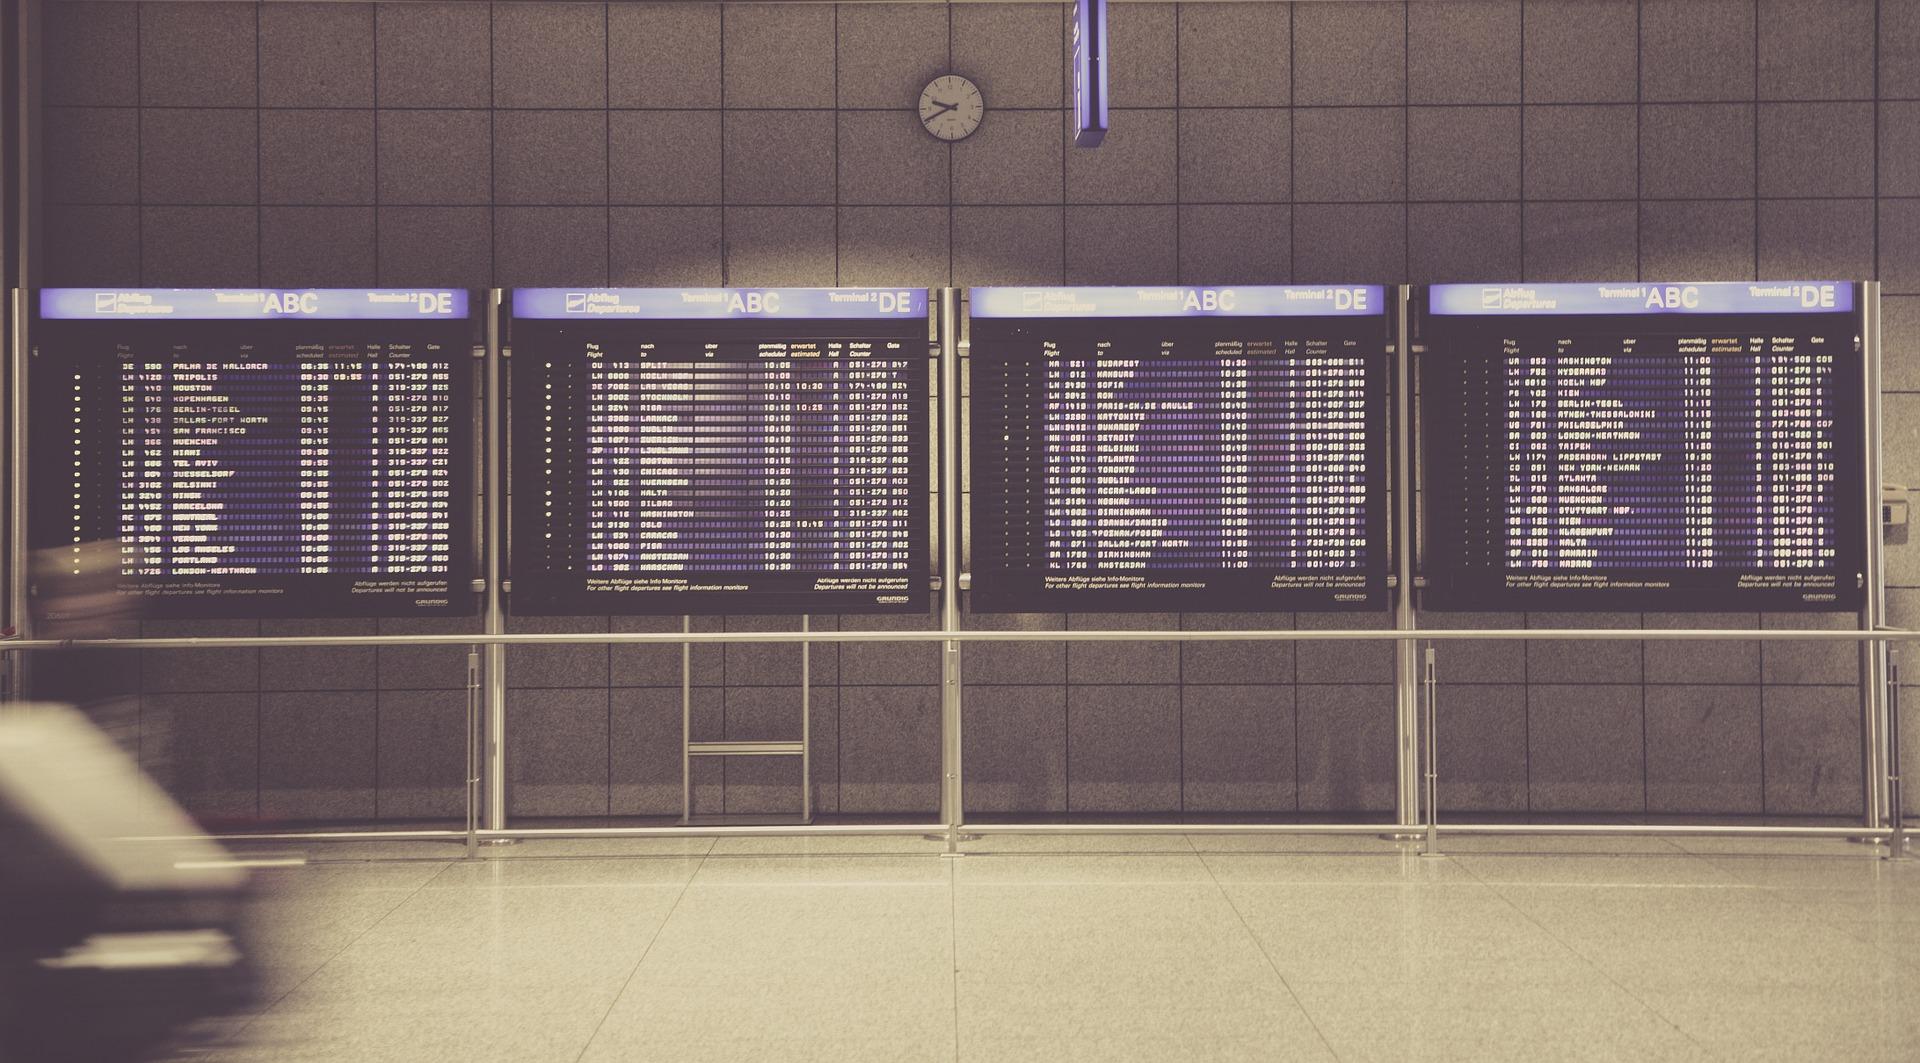 International tutor, flying on international business trips!